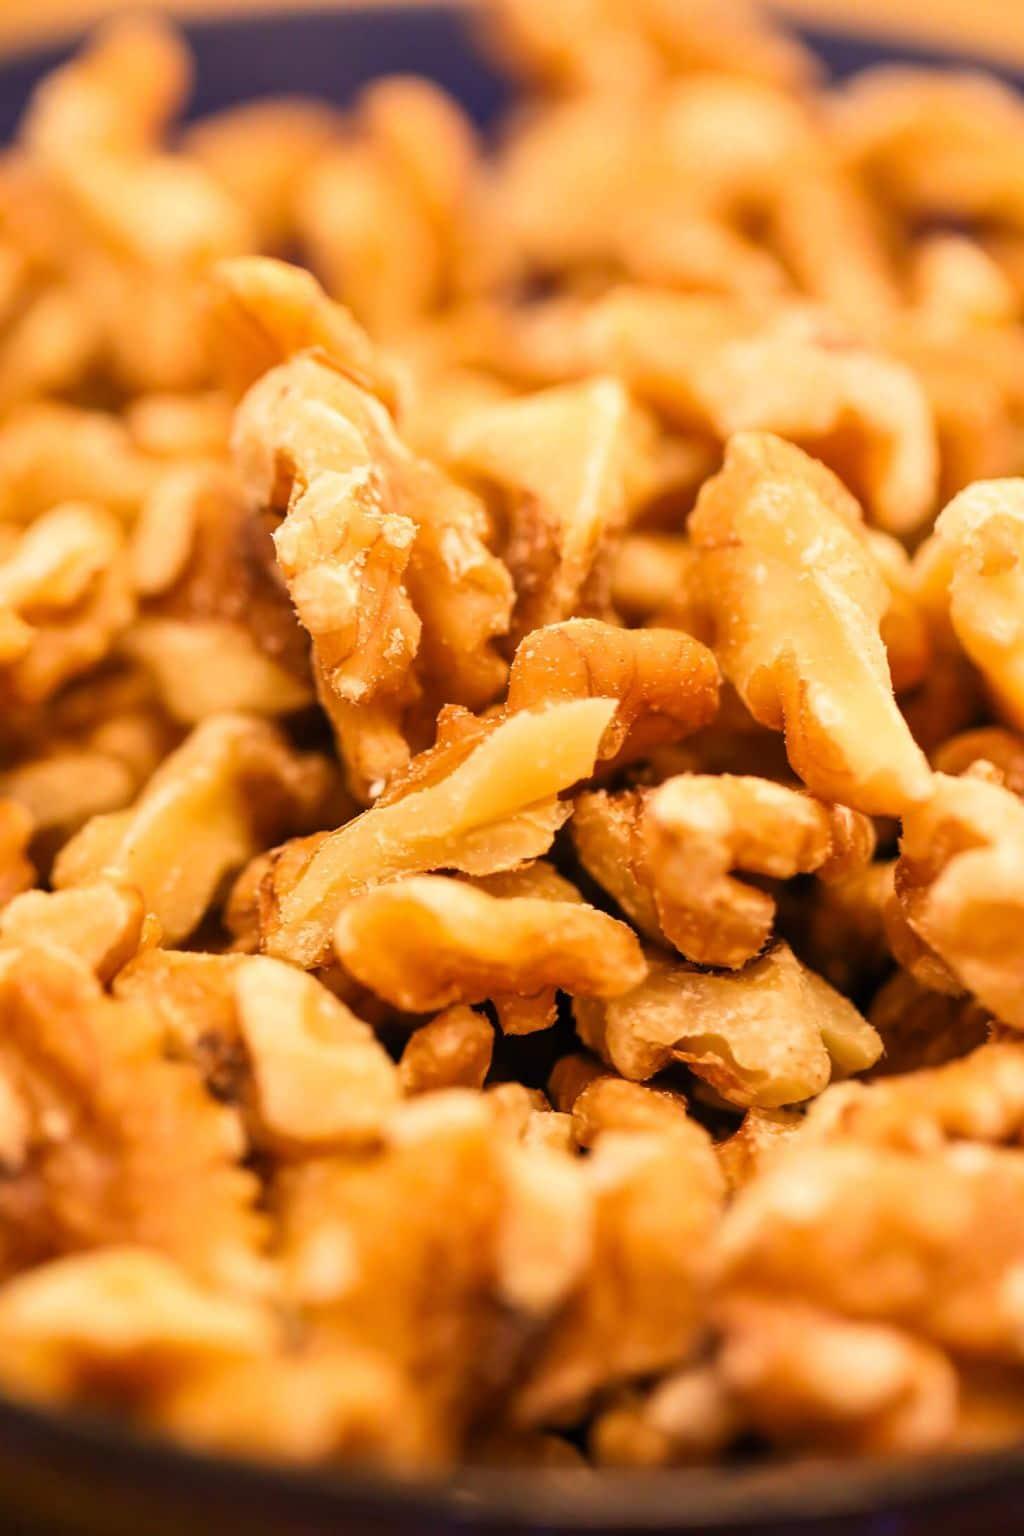 roasted walnuts